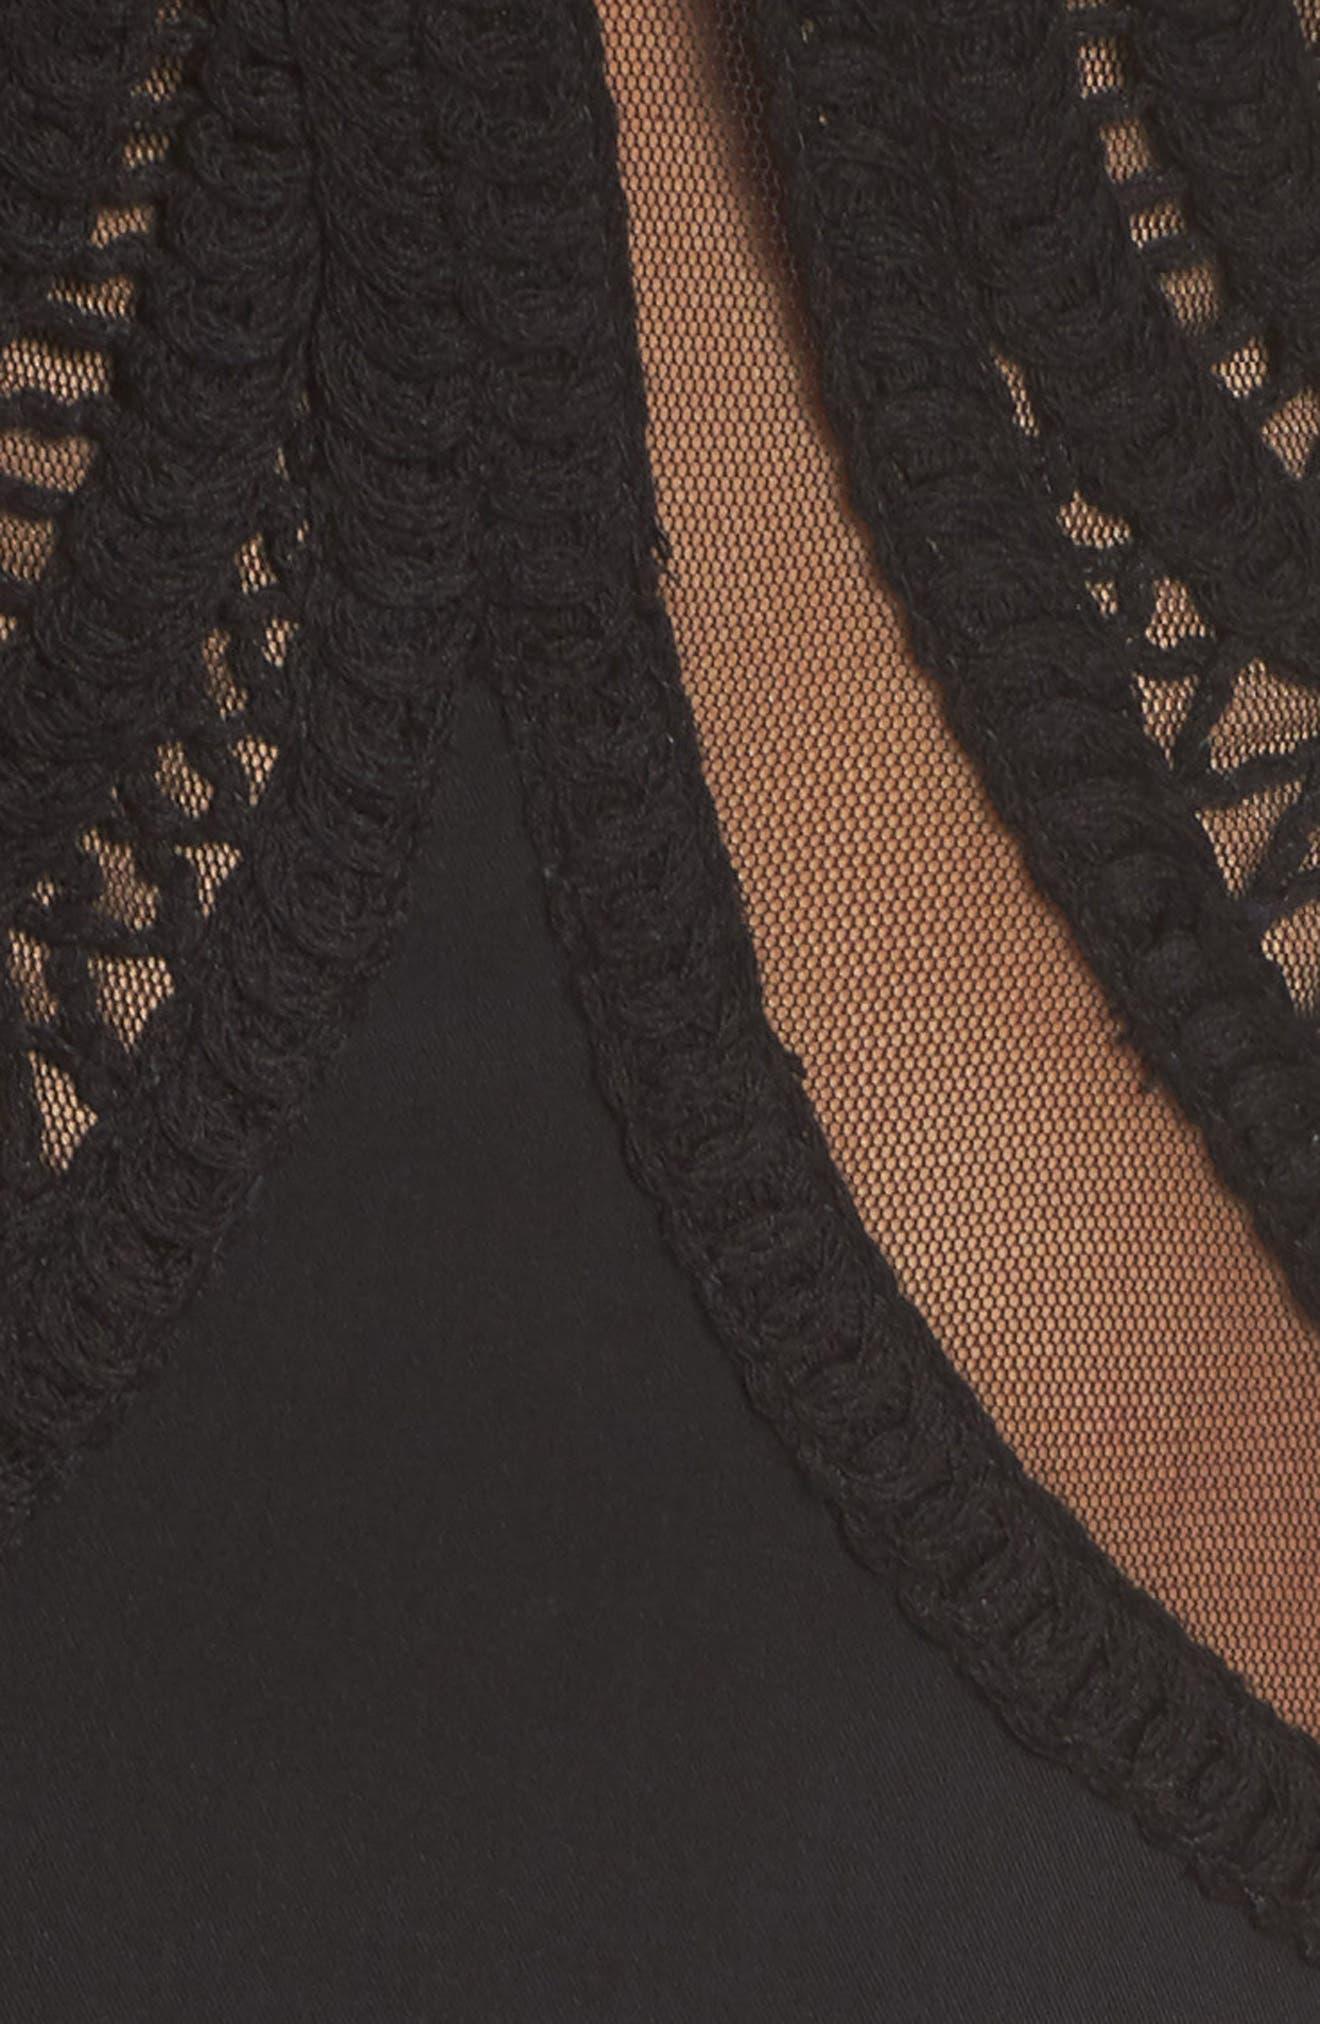 Crochet Lace Gown,                             Alternate thumbnail 5, color,                             Black/ Nude